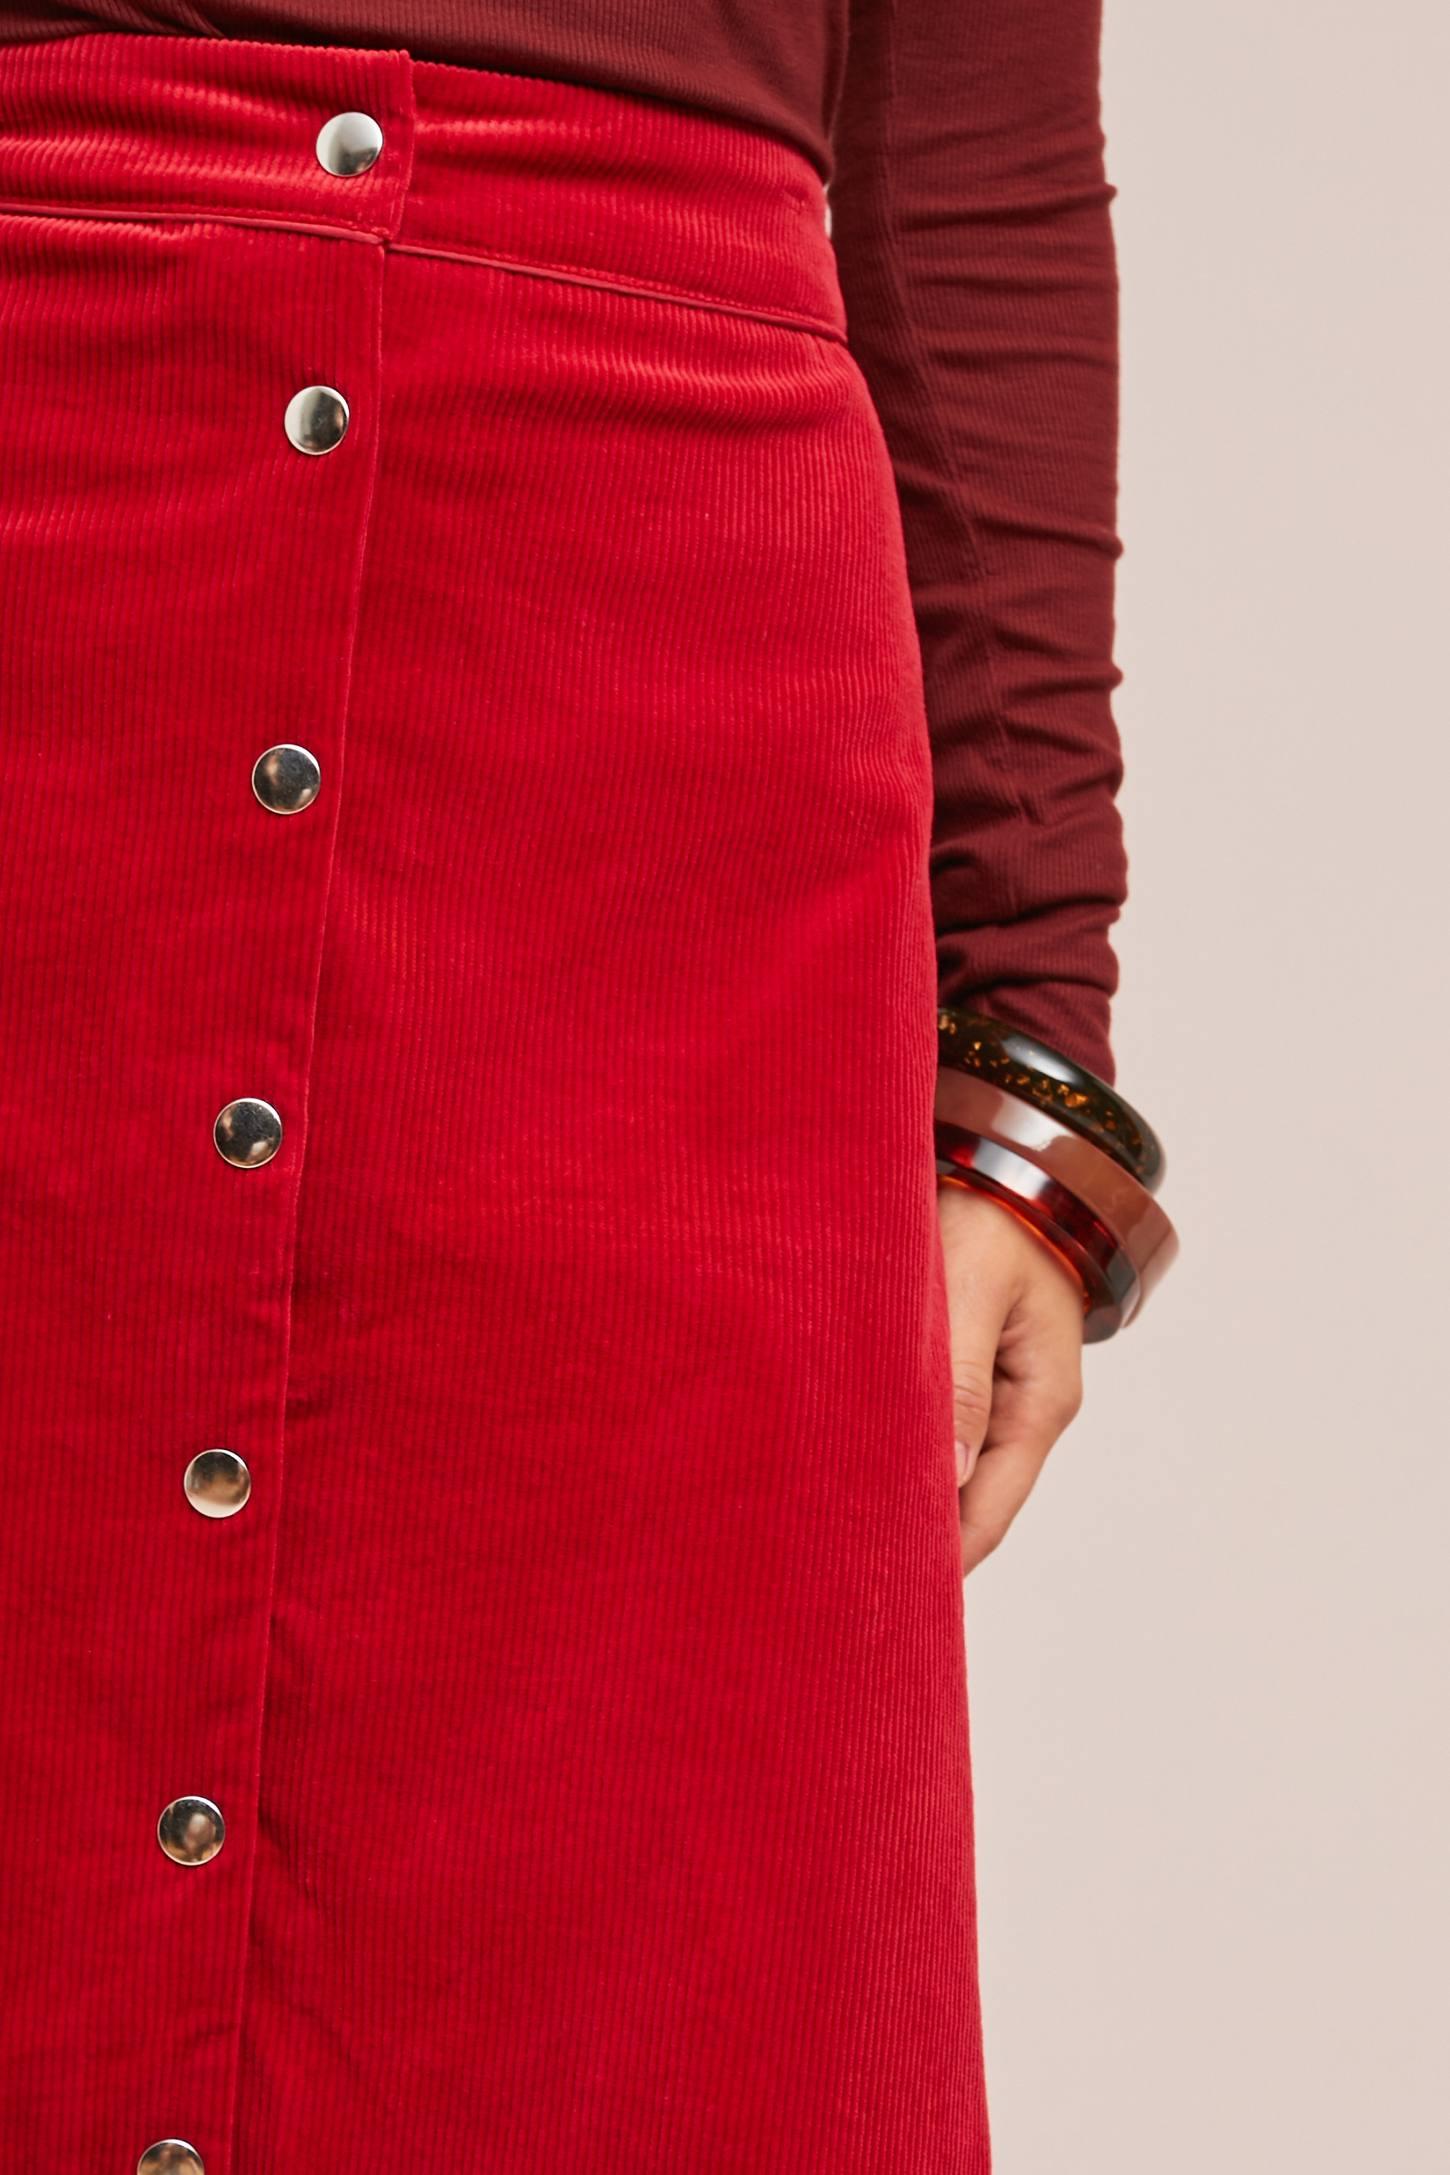 Corduroy Buttondown Skirt   Anthropologie